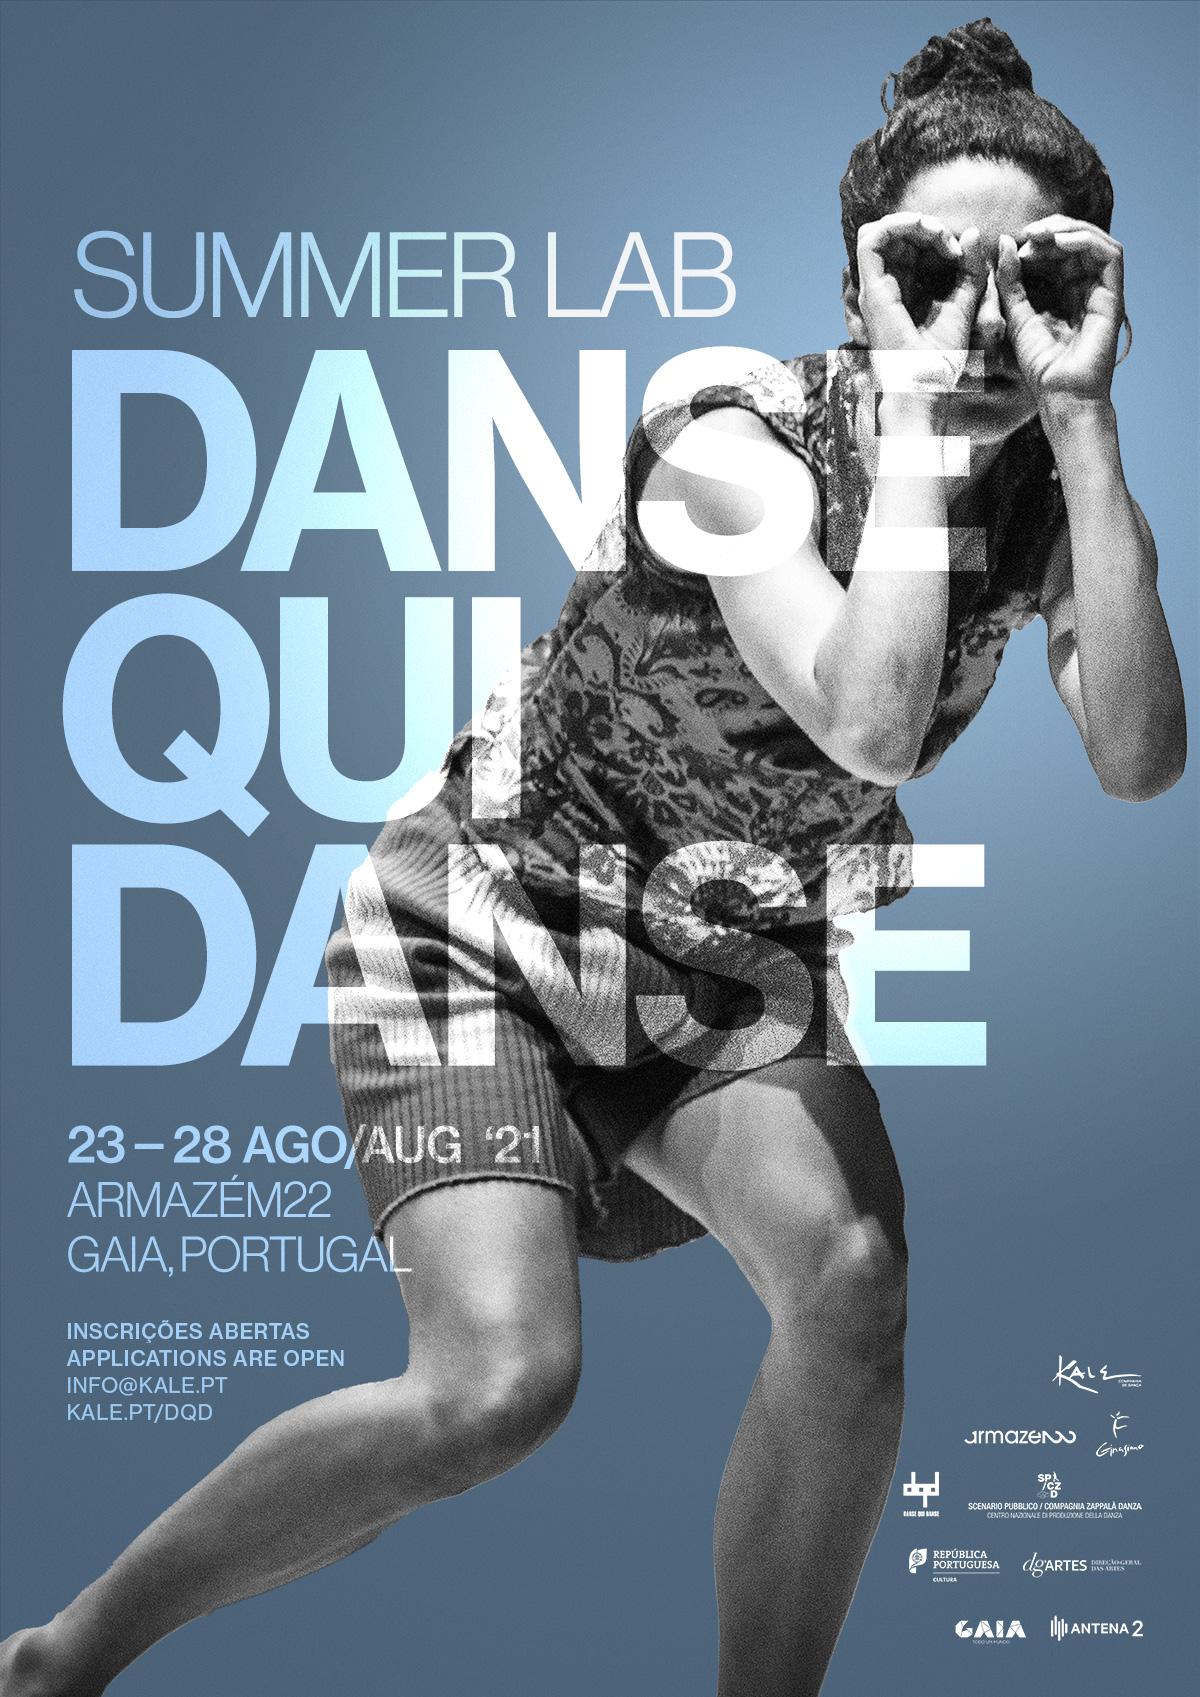 DANSEQUIDANSE21_summerlab_facebookpost